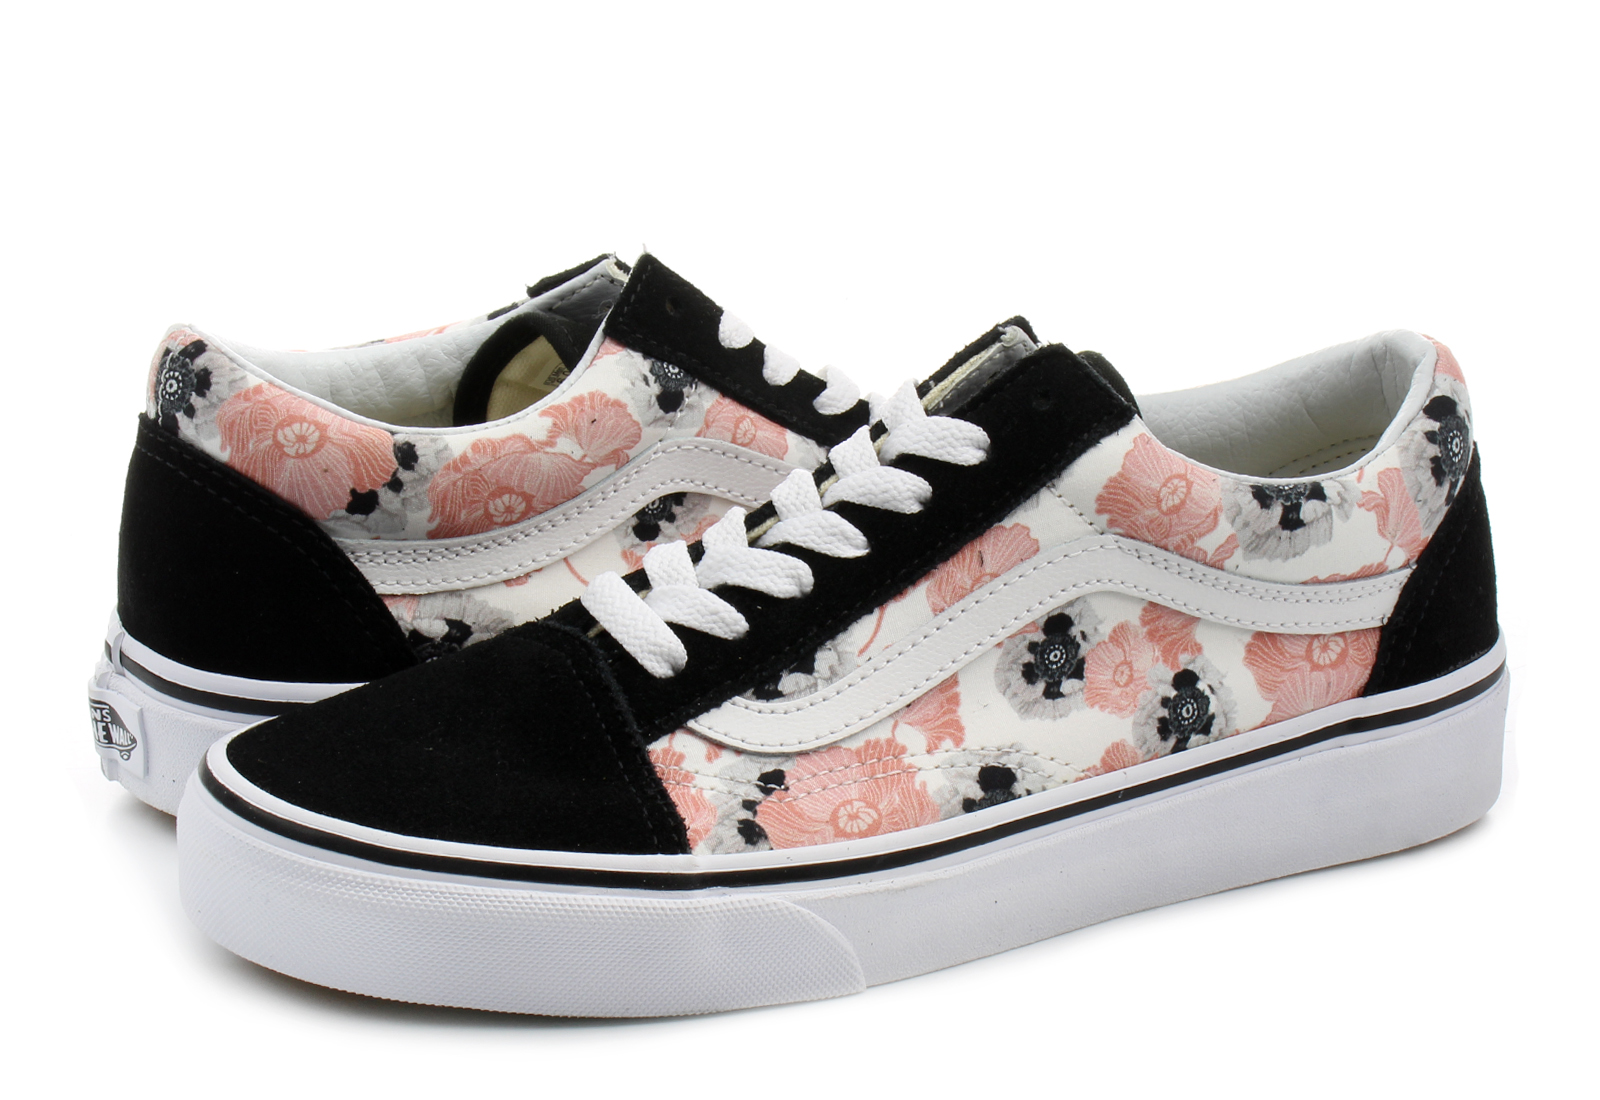 3f6fadfbbe Vans Niske Tenisice Sa Uzorkom Tenisice - Old Skool - Office Shoes ...